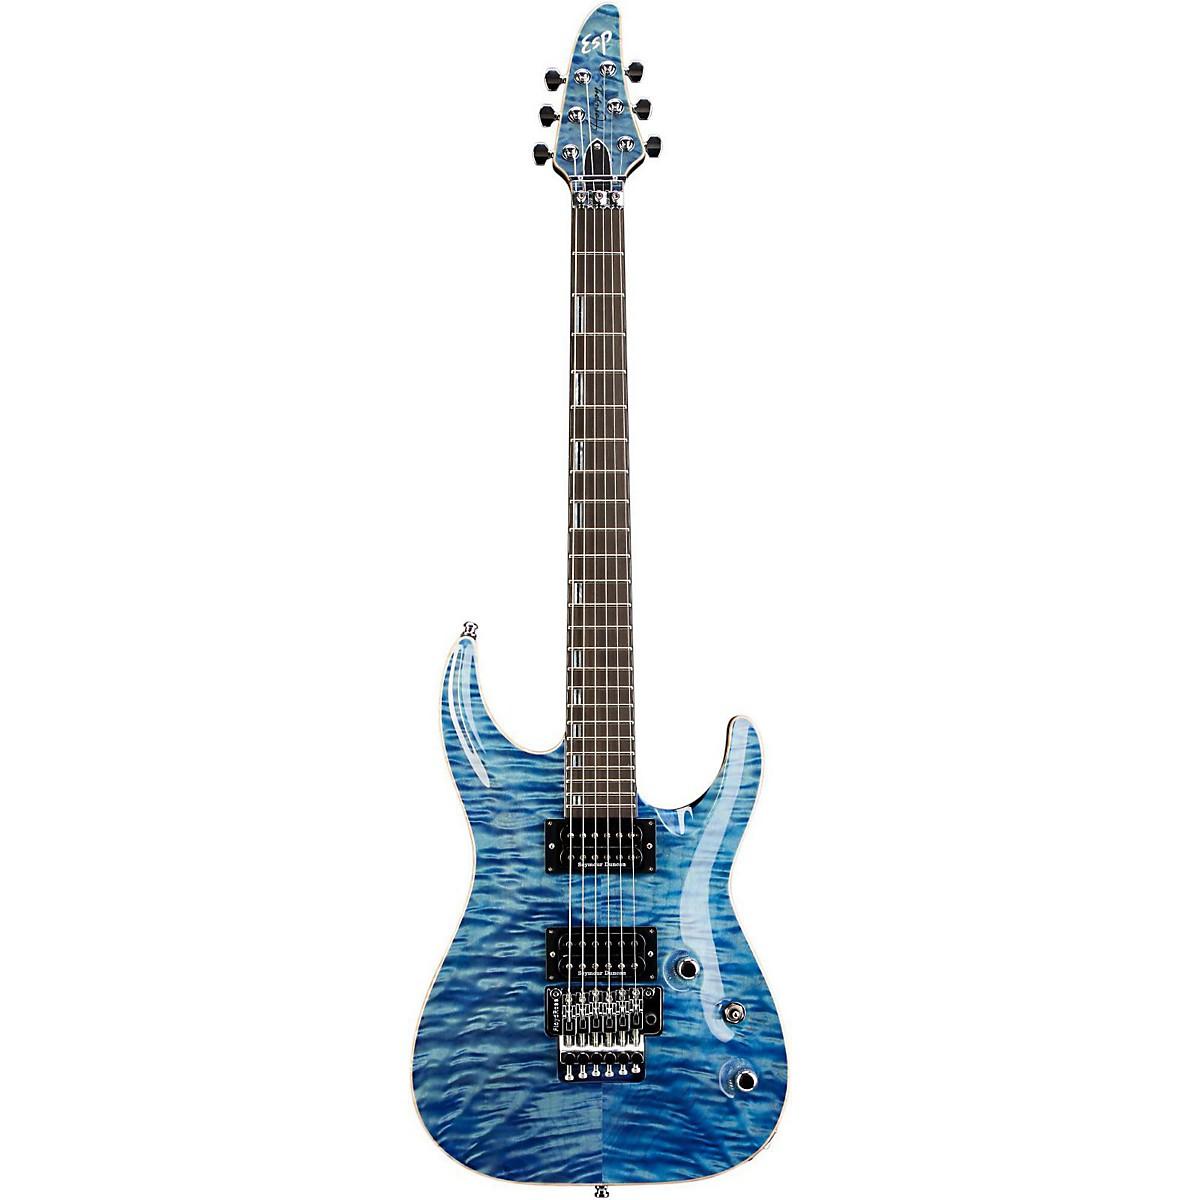 ESP Original Horizon CTM Electric Guitar with Floyd Rose